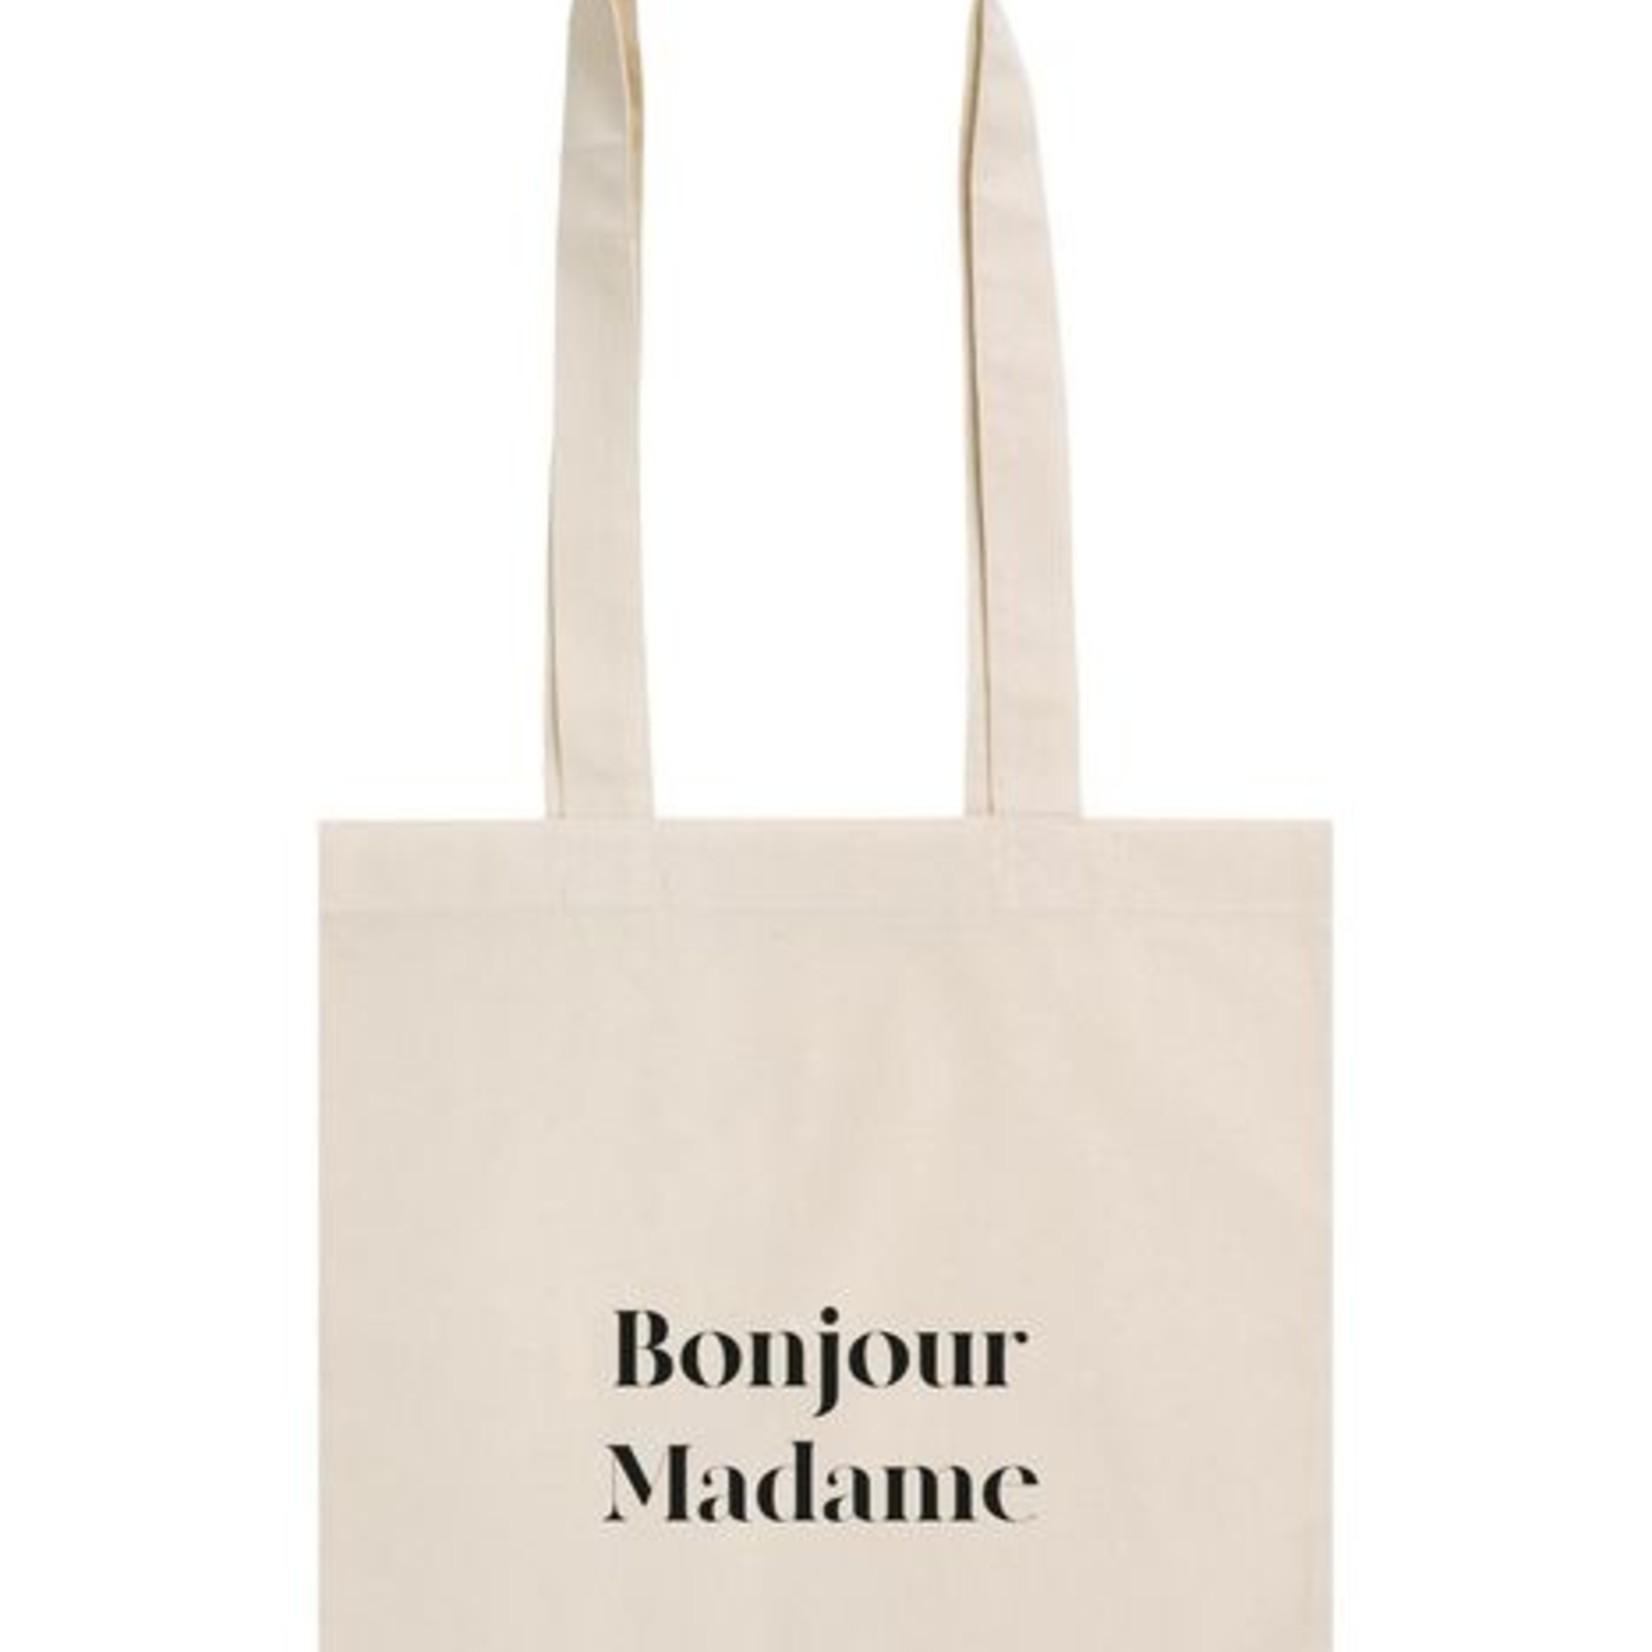 Zusss Katoenen tasje - Bonjour madame